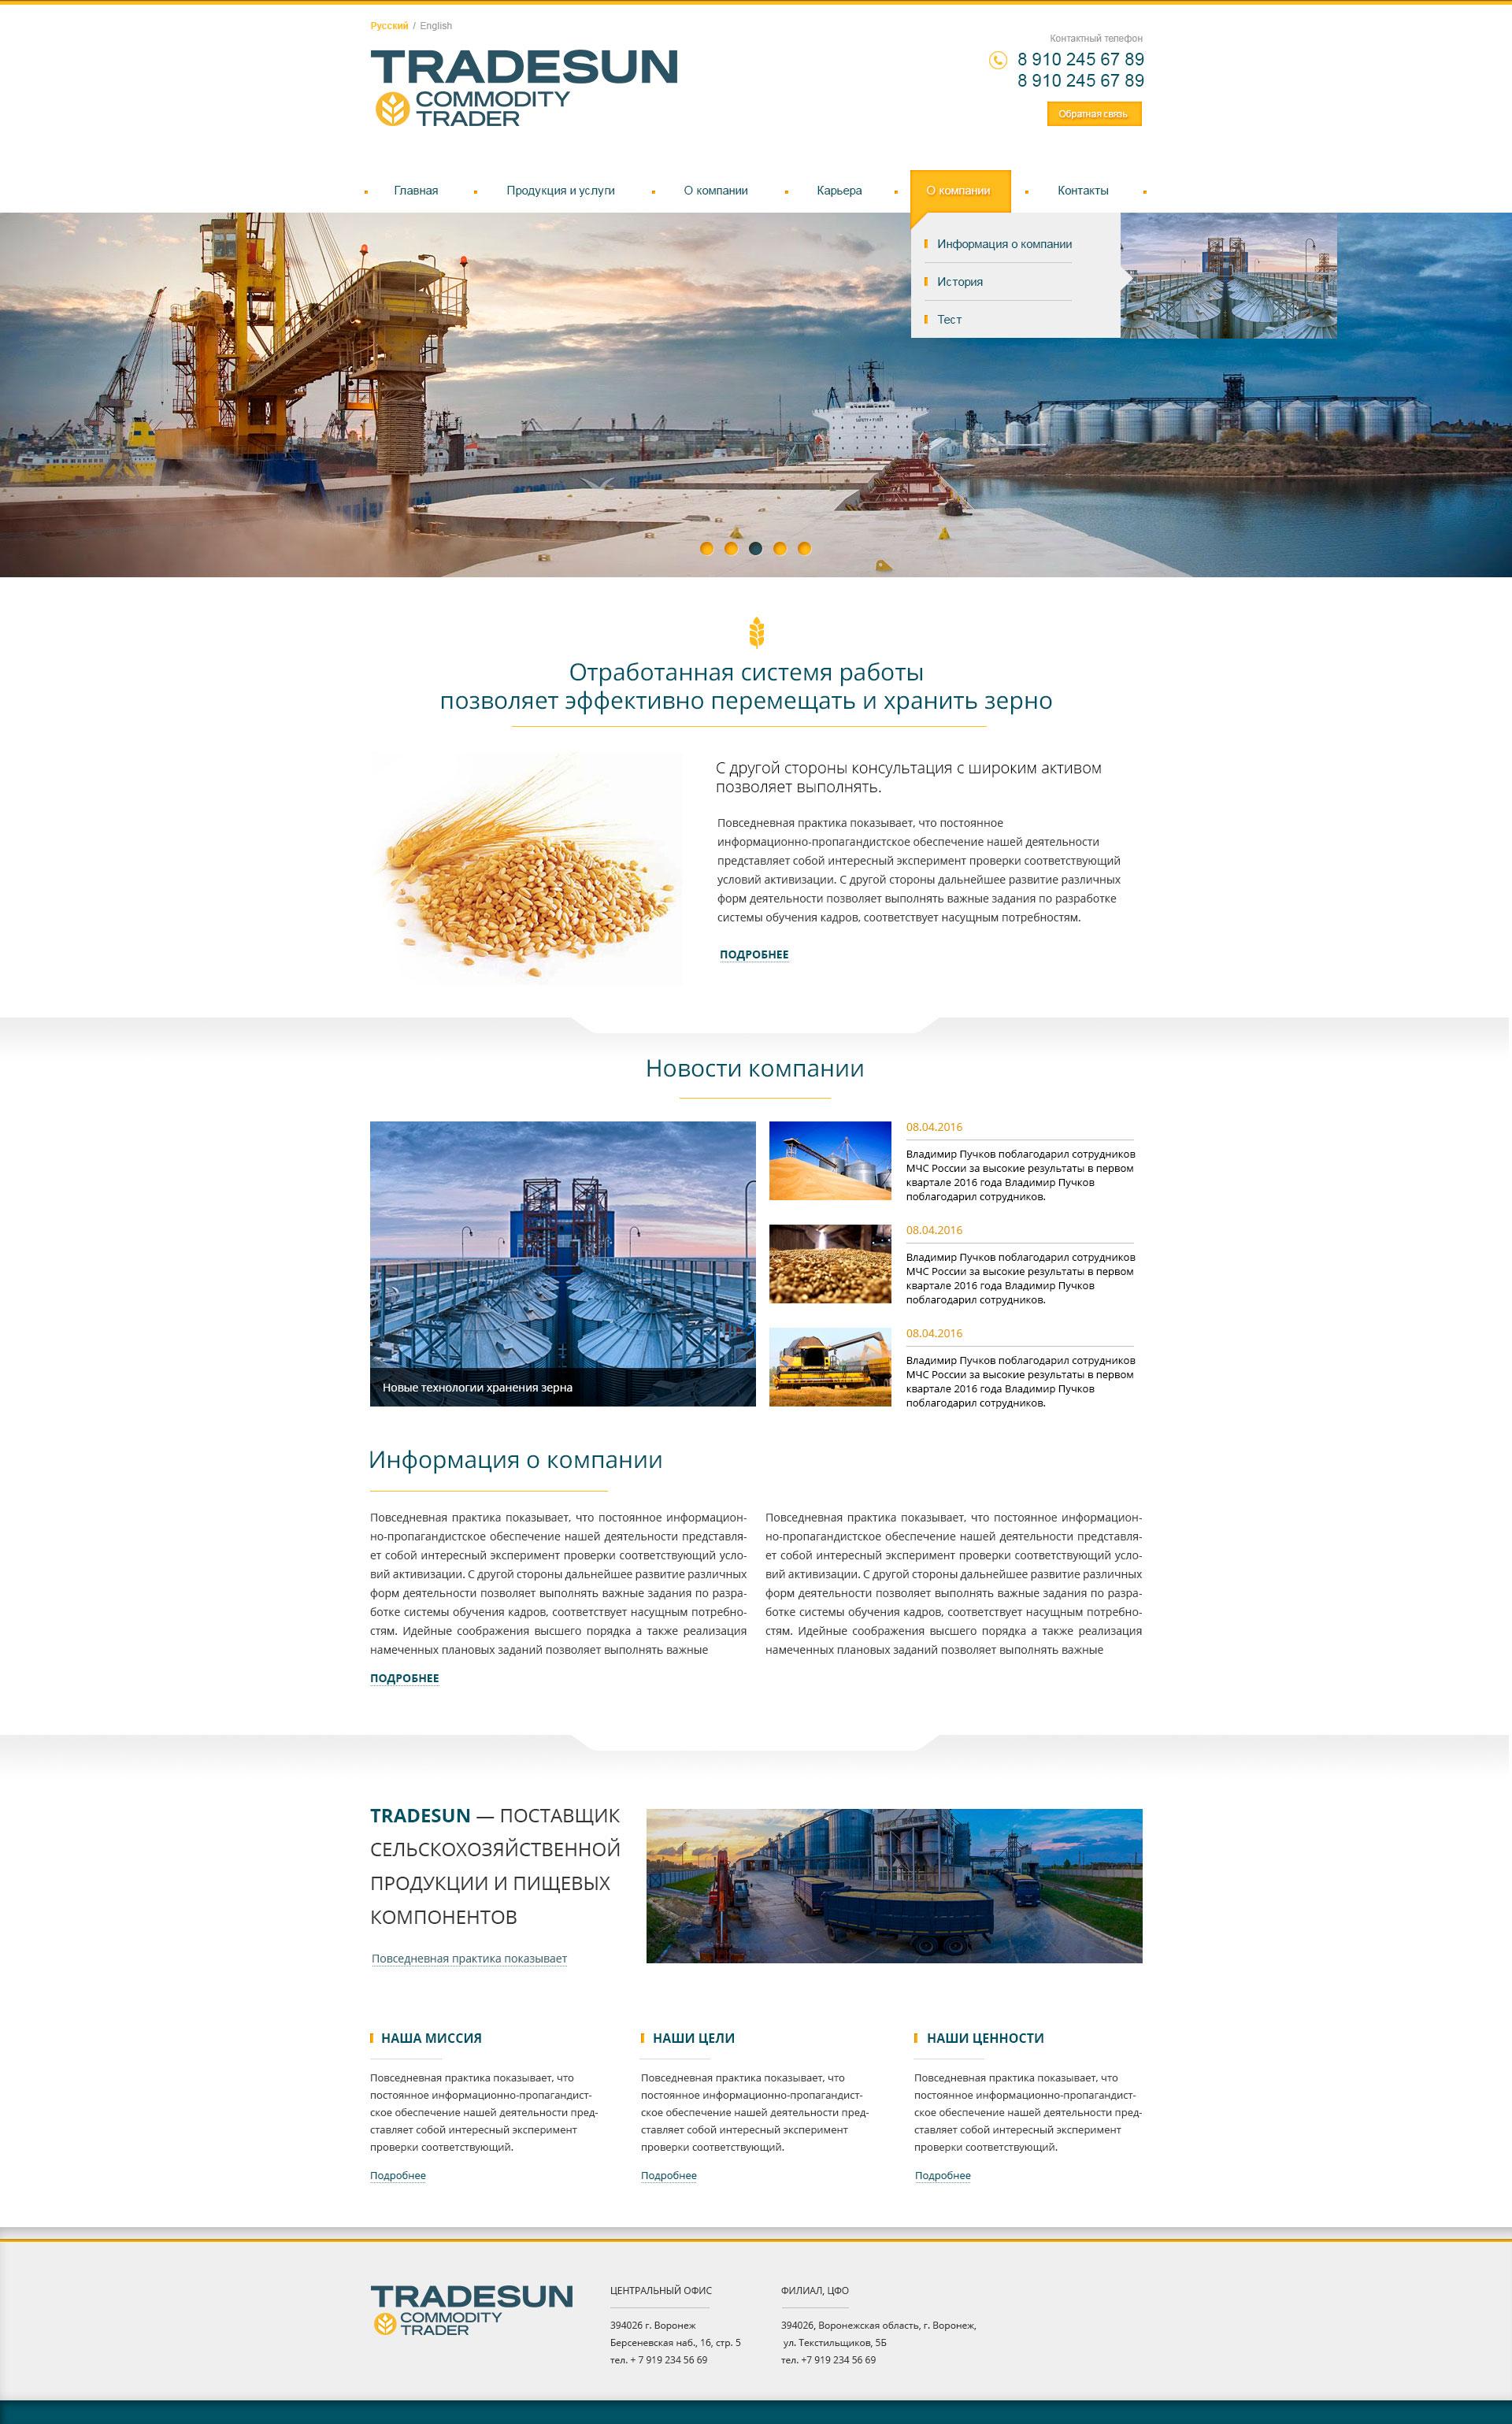 b2b сайты примеры Tradesun 1920 px